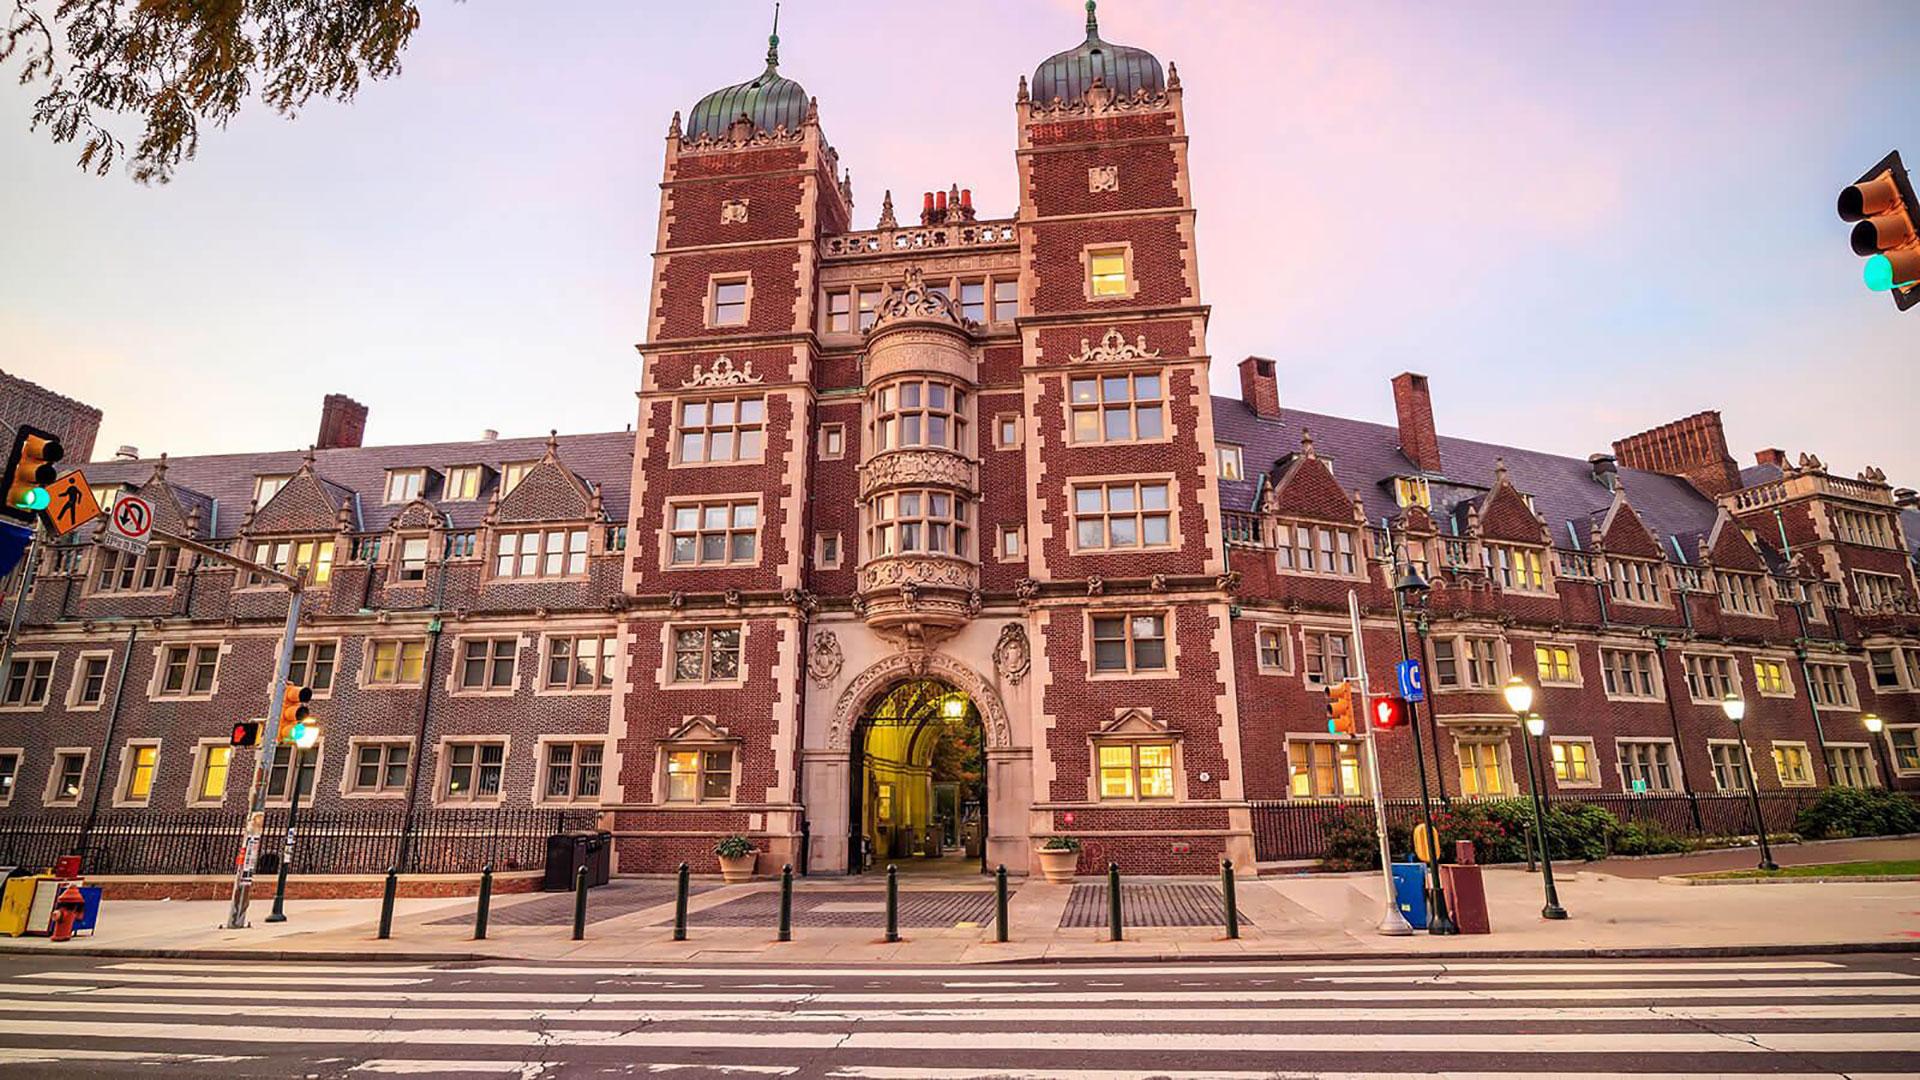 The University of Pennsylvania Graduate School of Education